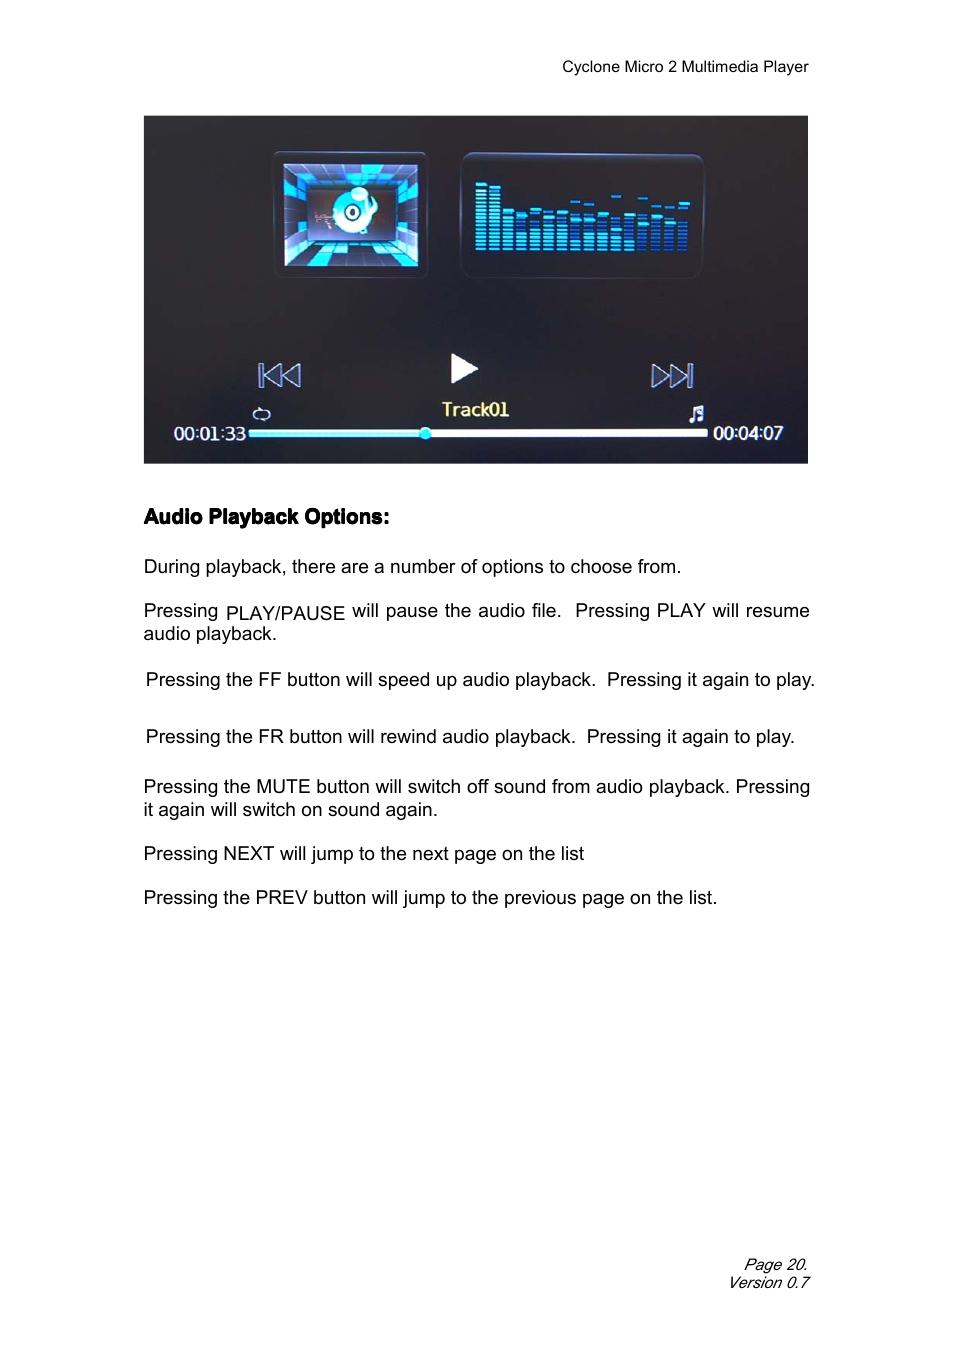 audioplaybackoptions advancedaudiosettings satechi cyclone micro rh manualsdir com cyclone micro 2+ user manual Operators Manual